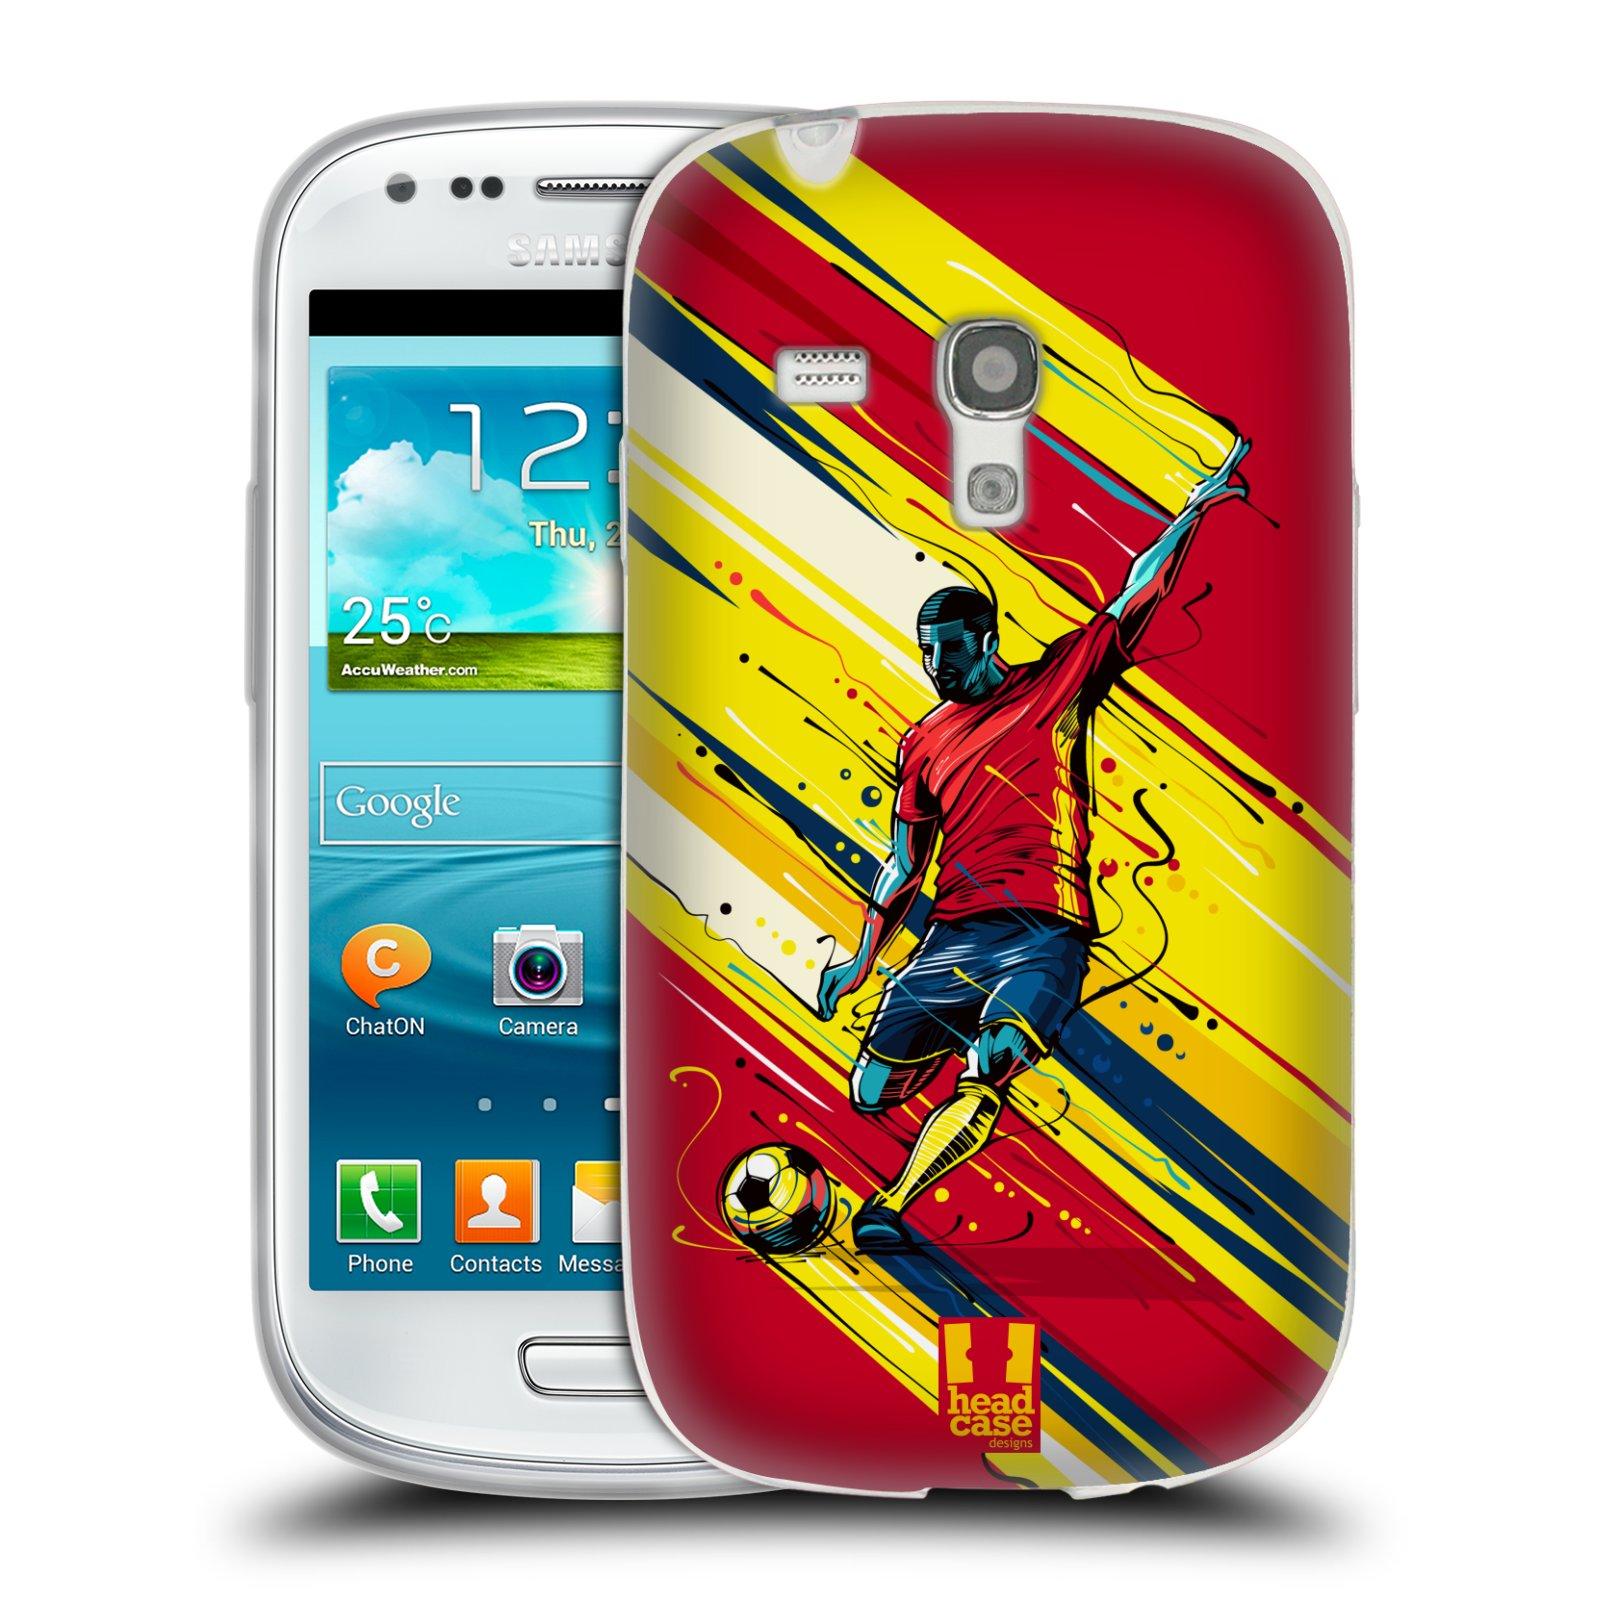 HEAD CASE silikonový obal na mobil Samsung Galaxy S3 MINI Sport fotbal střela do brány